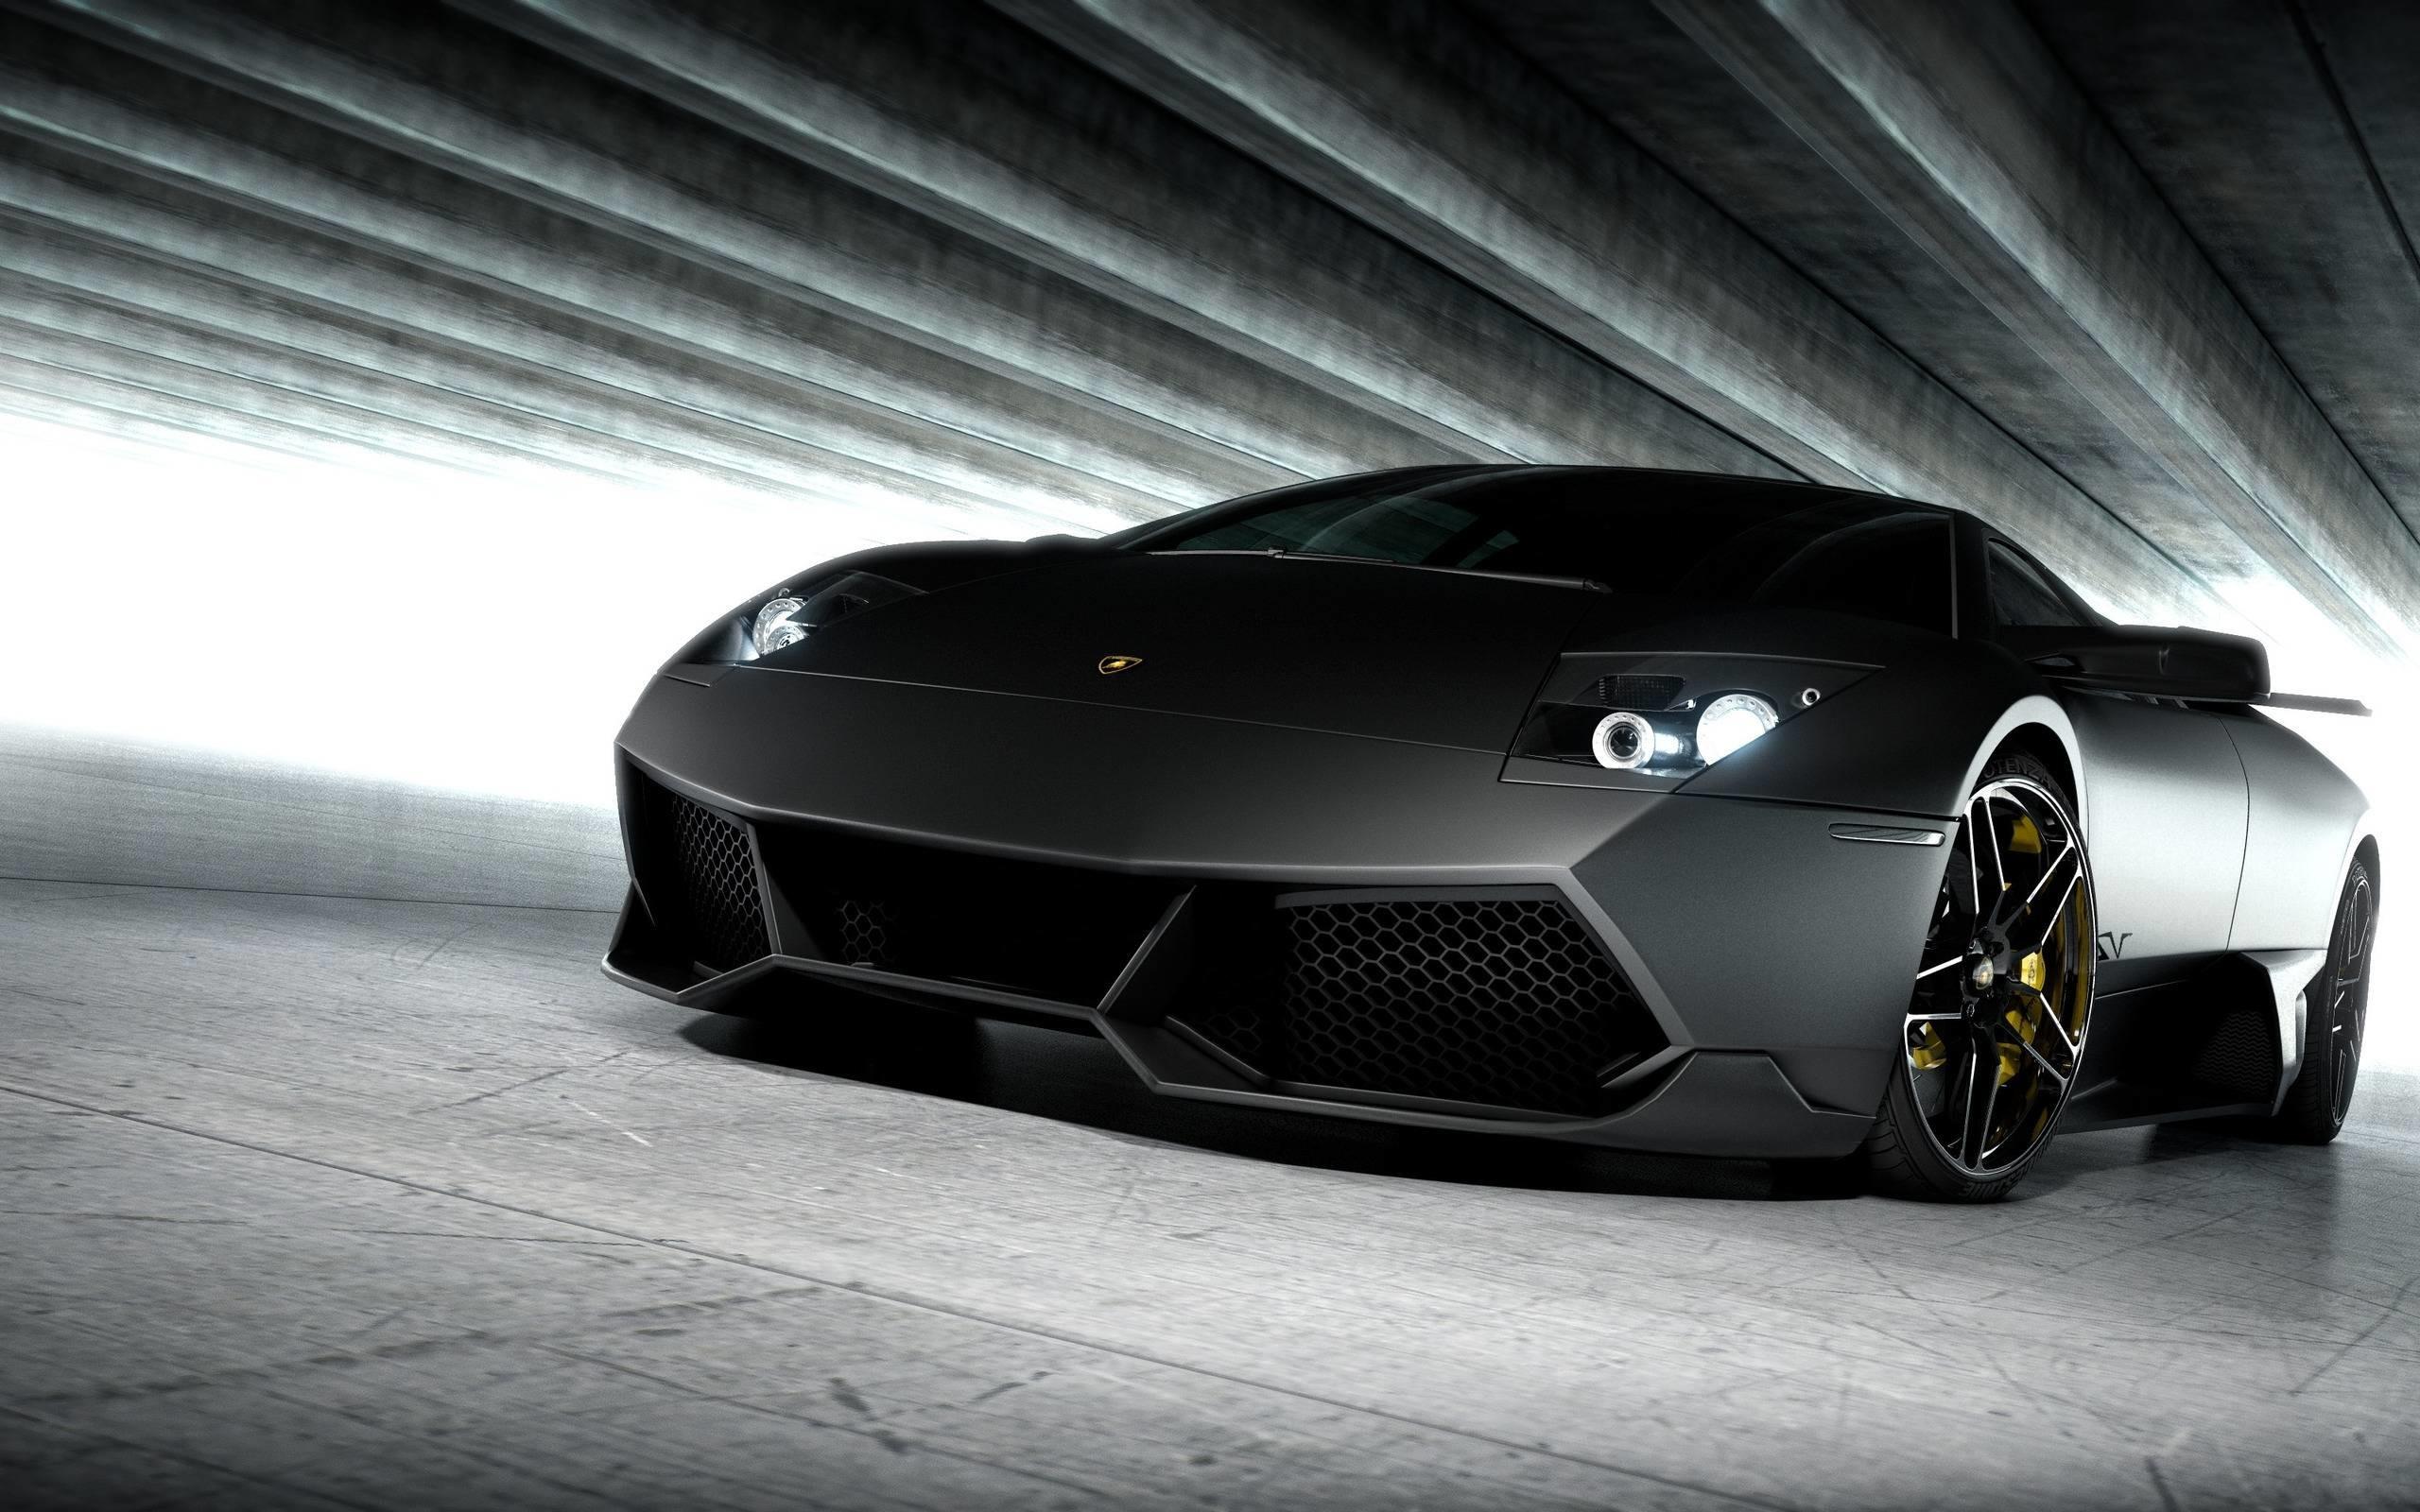 Lamborghini Wallpaper Cave (55+ images)